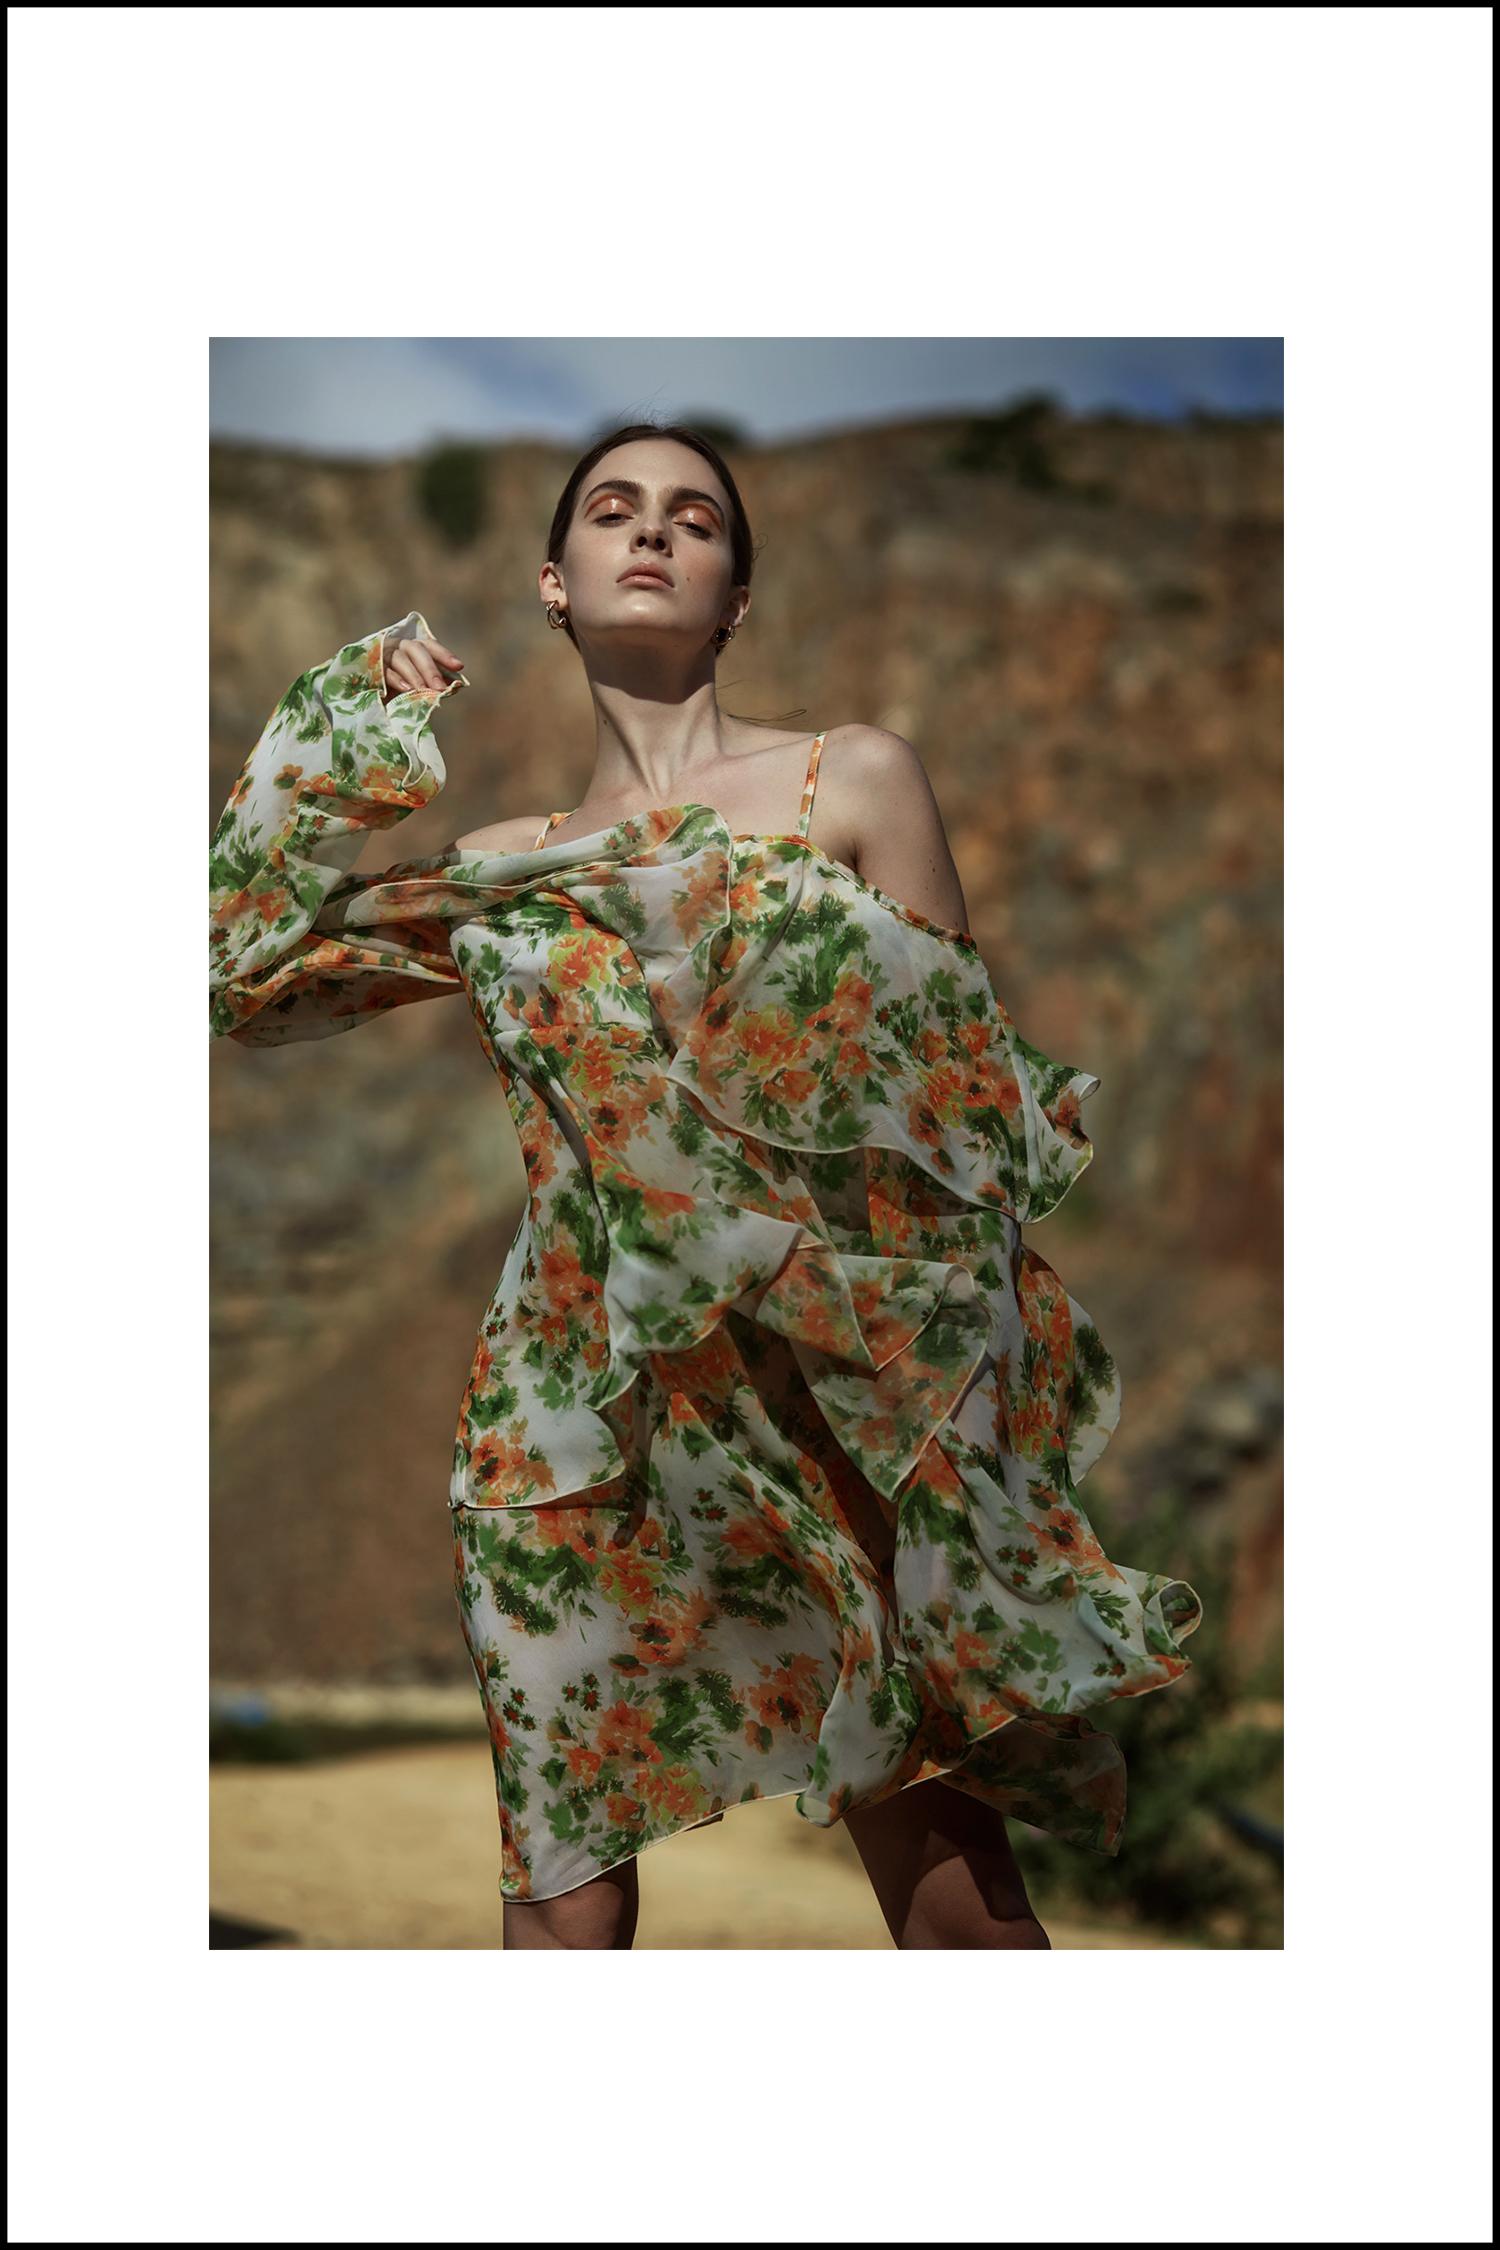 Orange-and-green floral dress, Michael Maven; gold hoop earrings, stylist's own